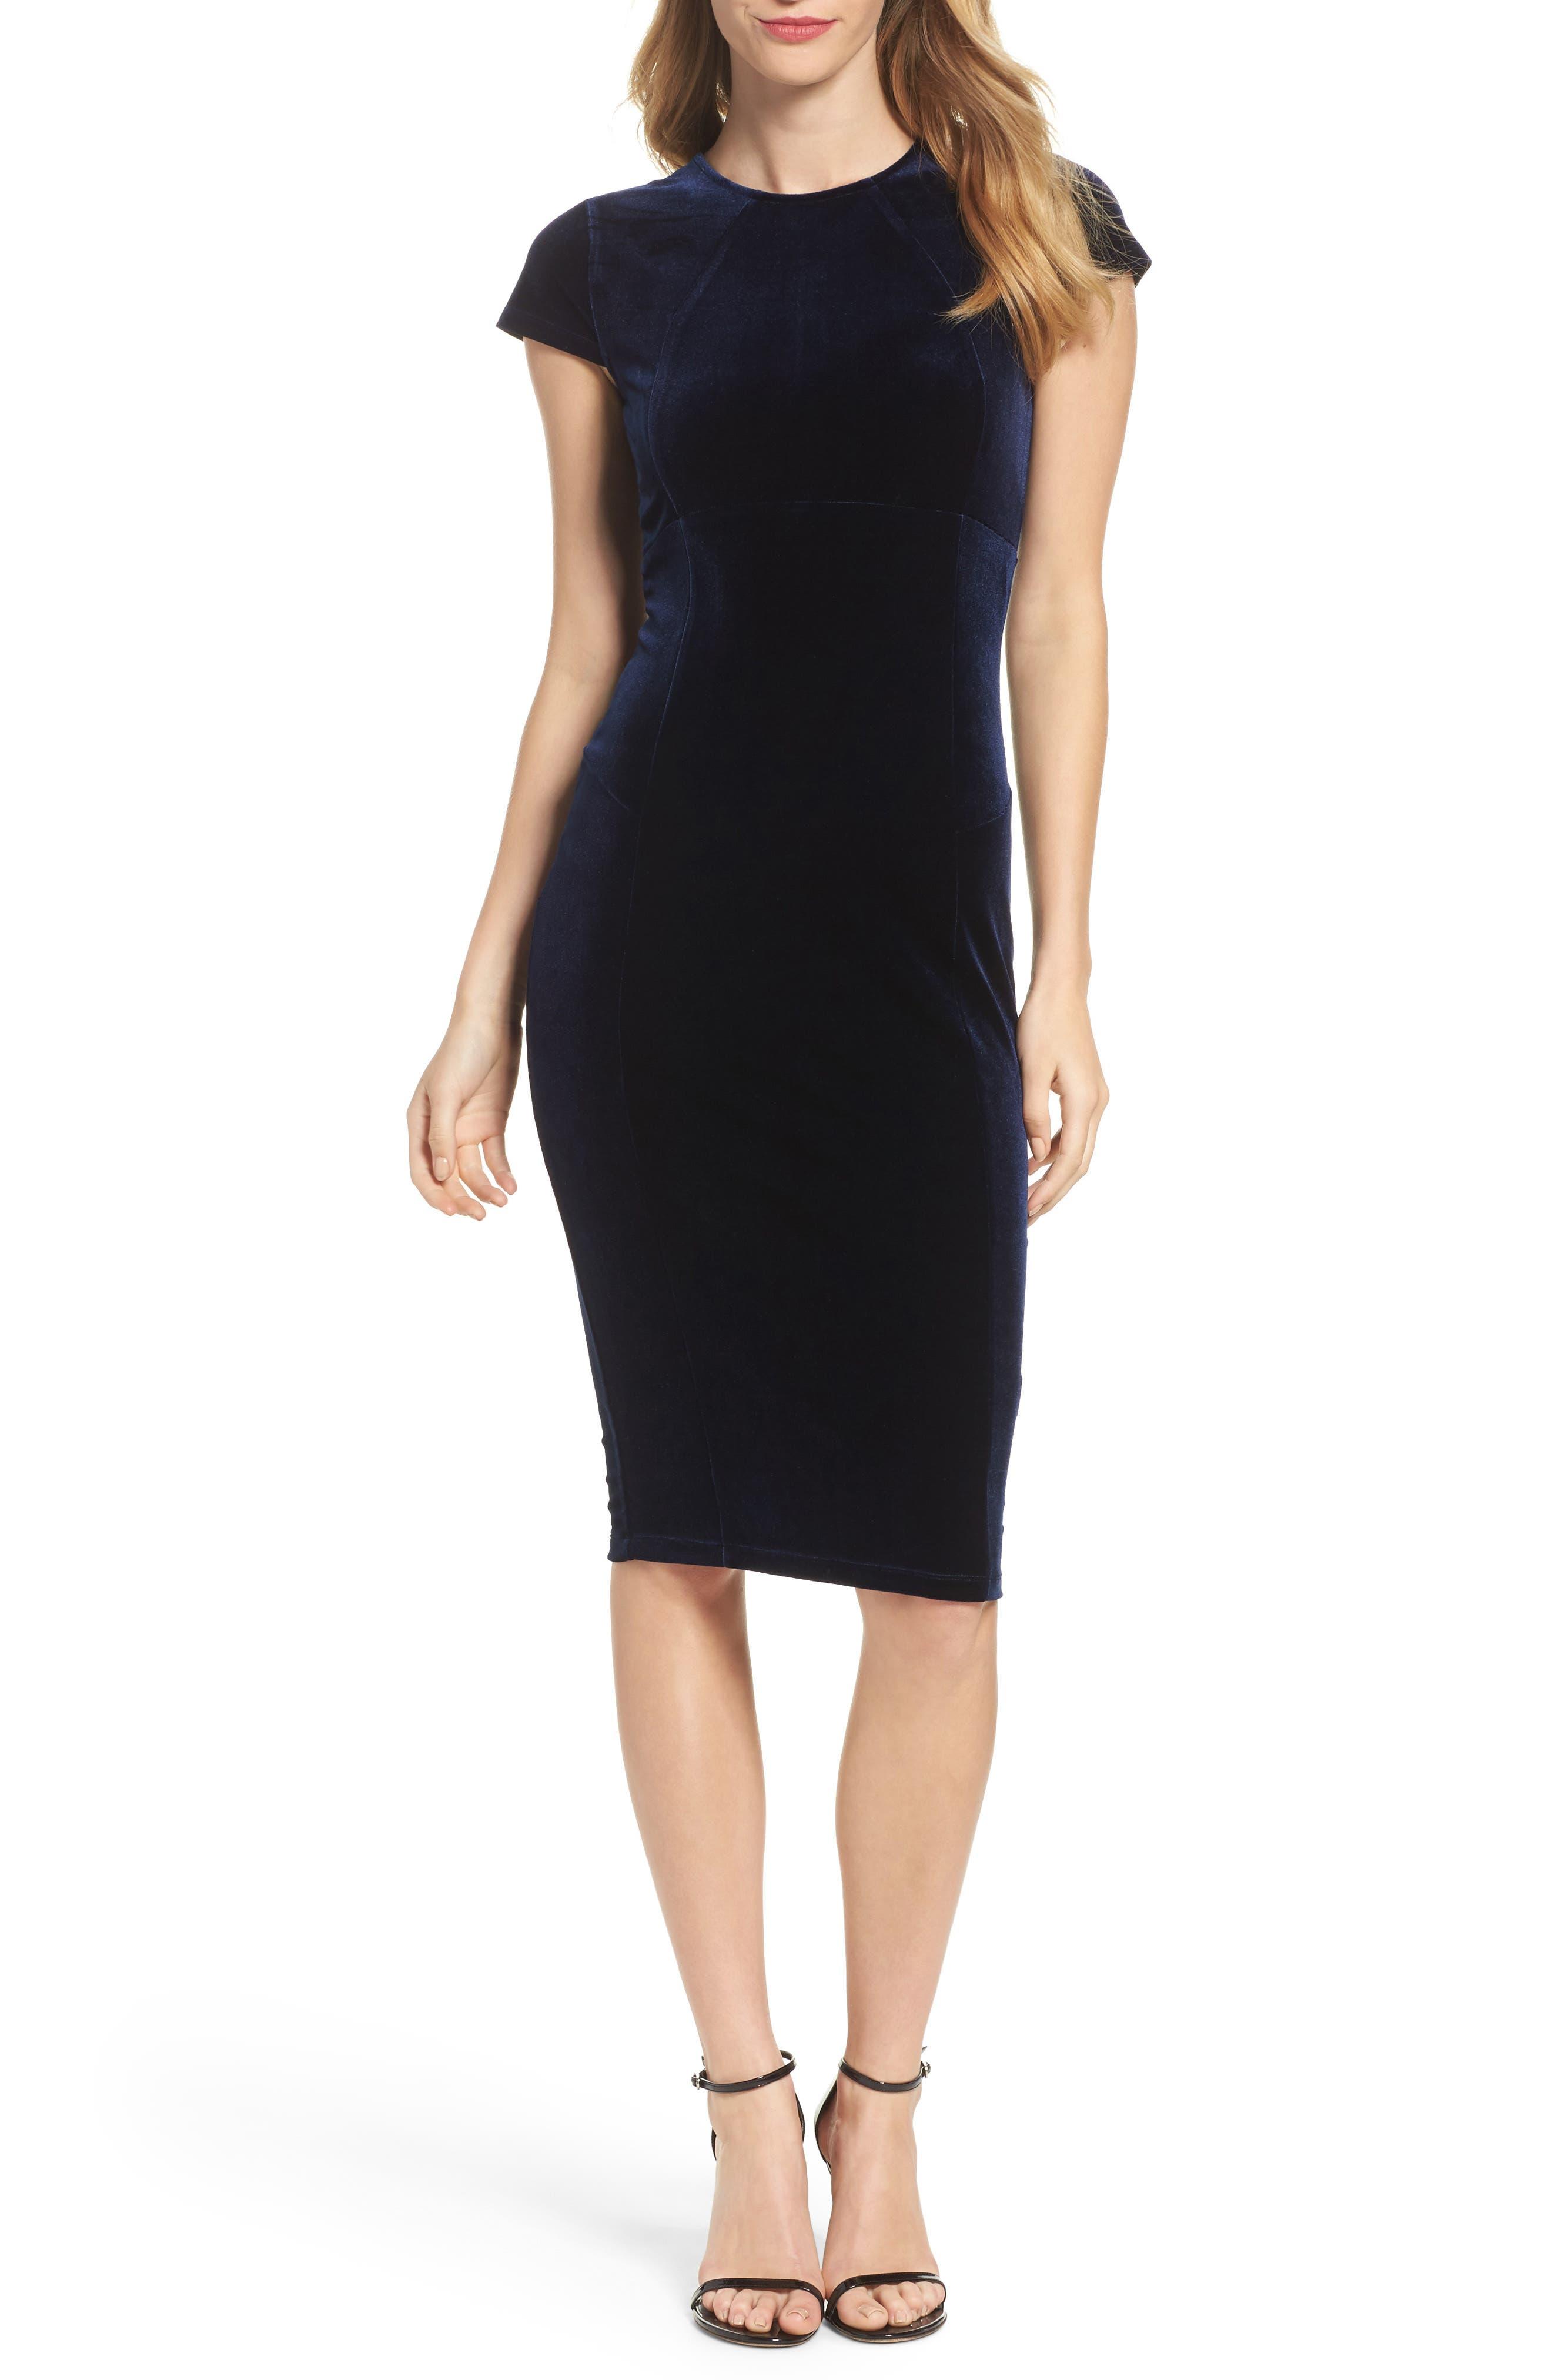 Main Image - Felicity & Coco Velvet Midi Dress (Regular & Petite) (Nordstrom Exclusive)